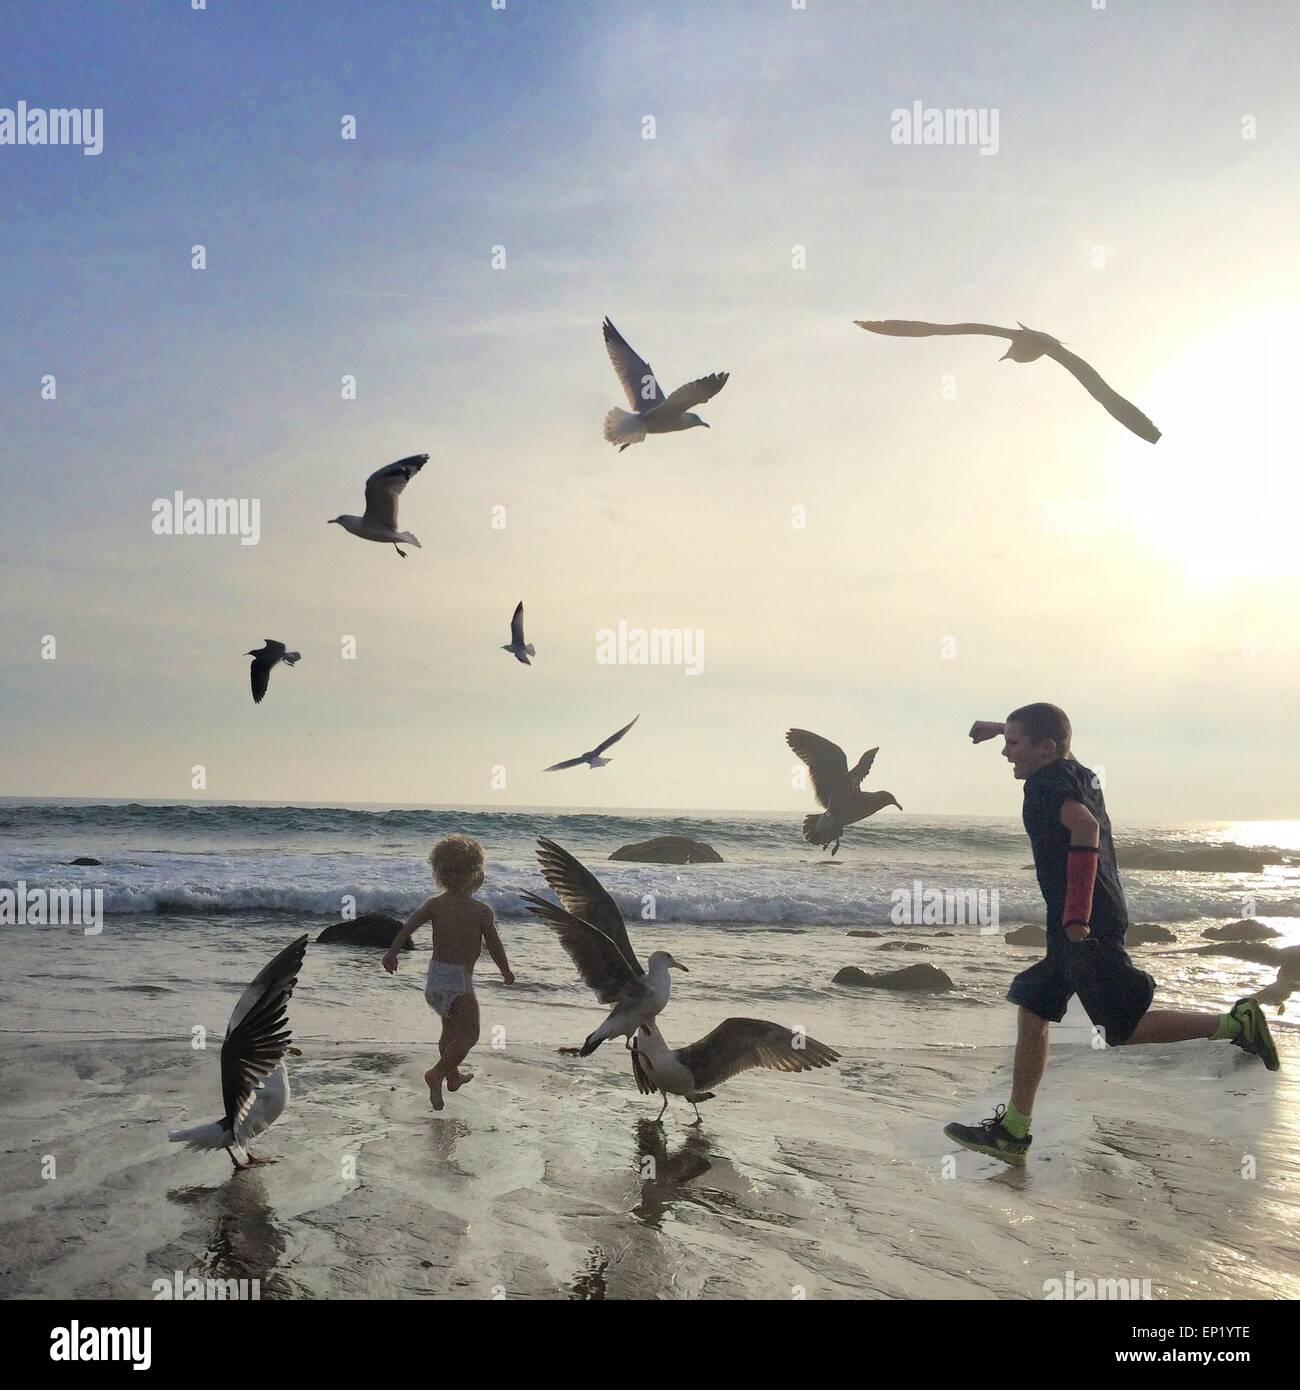 Two boys running on beach amongst seagulls - Stock Image